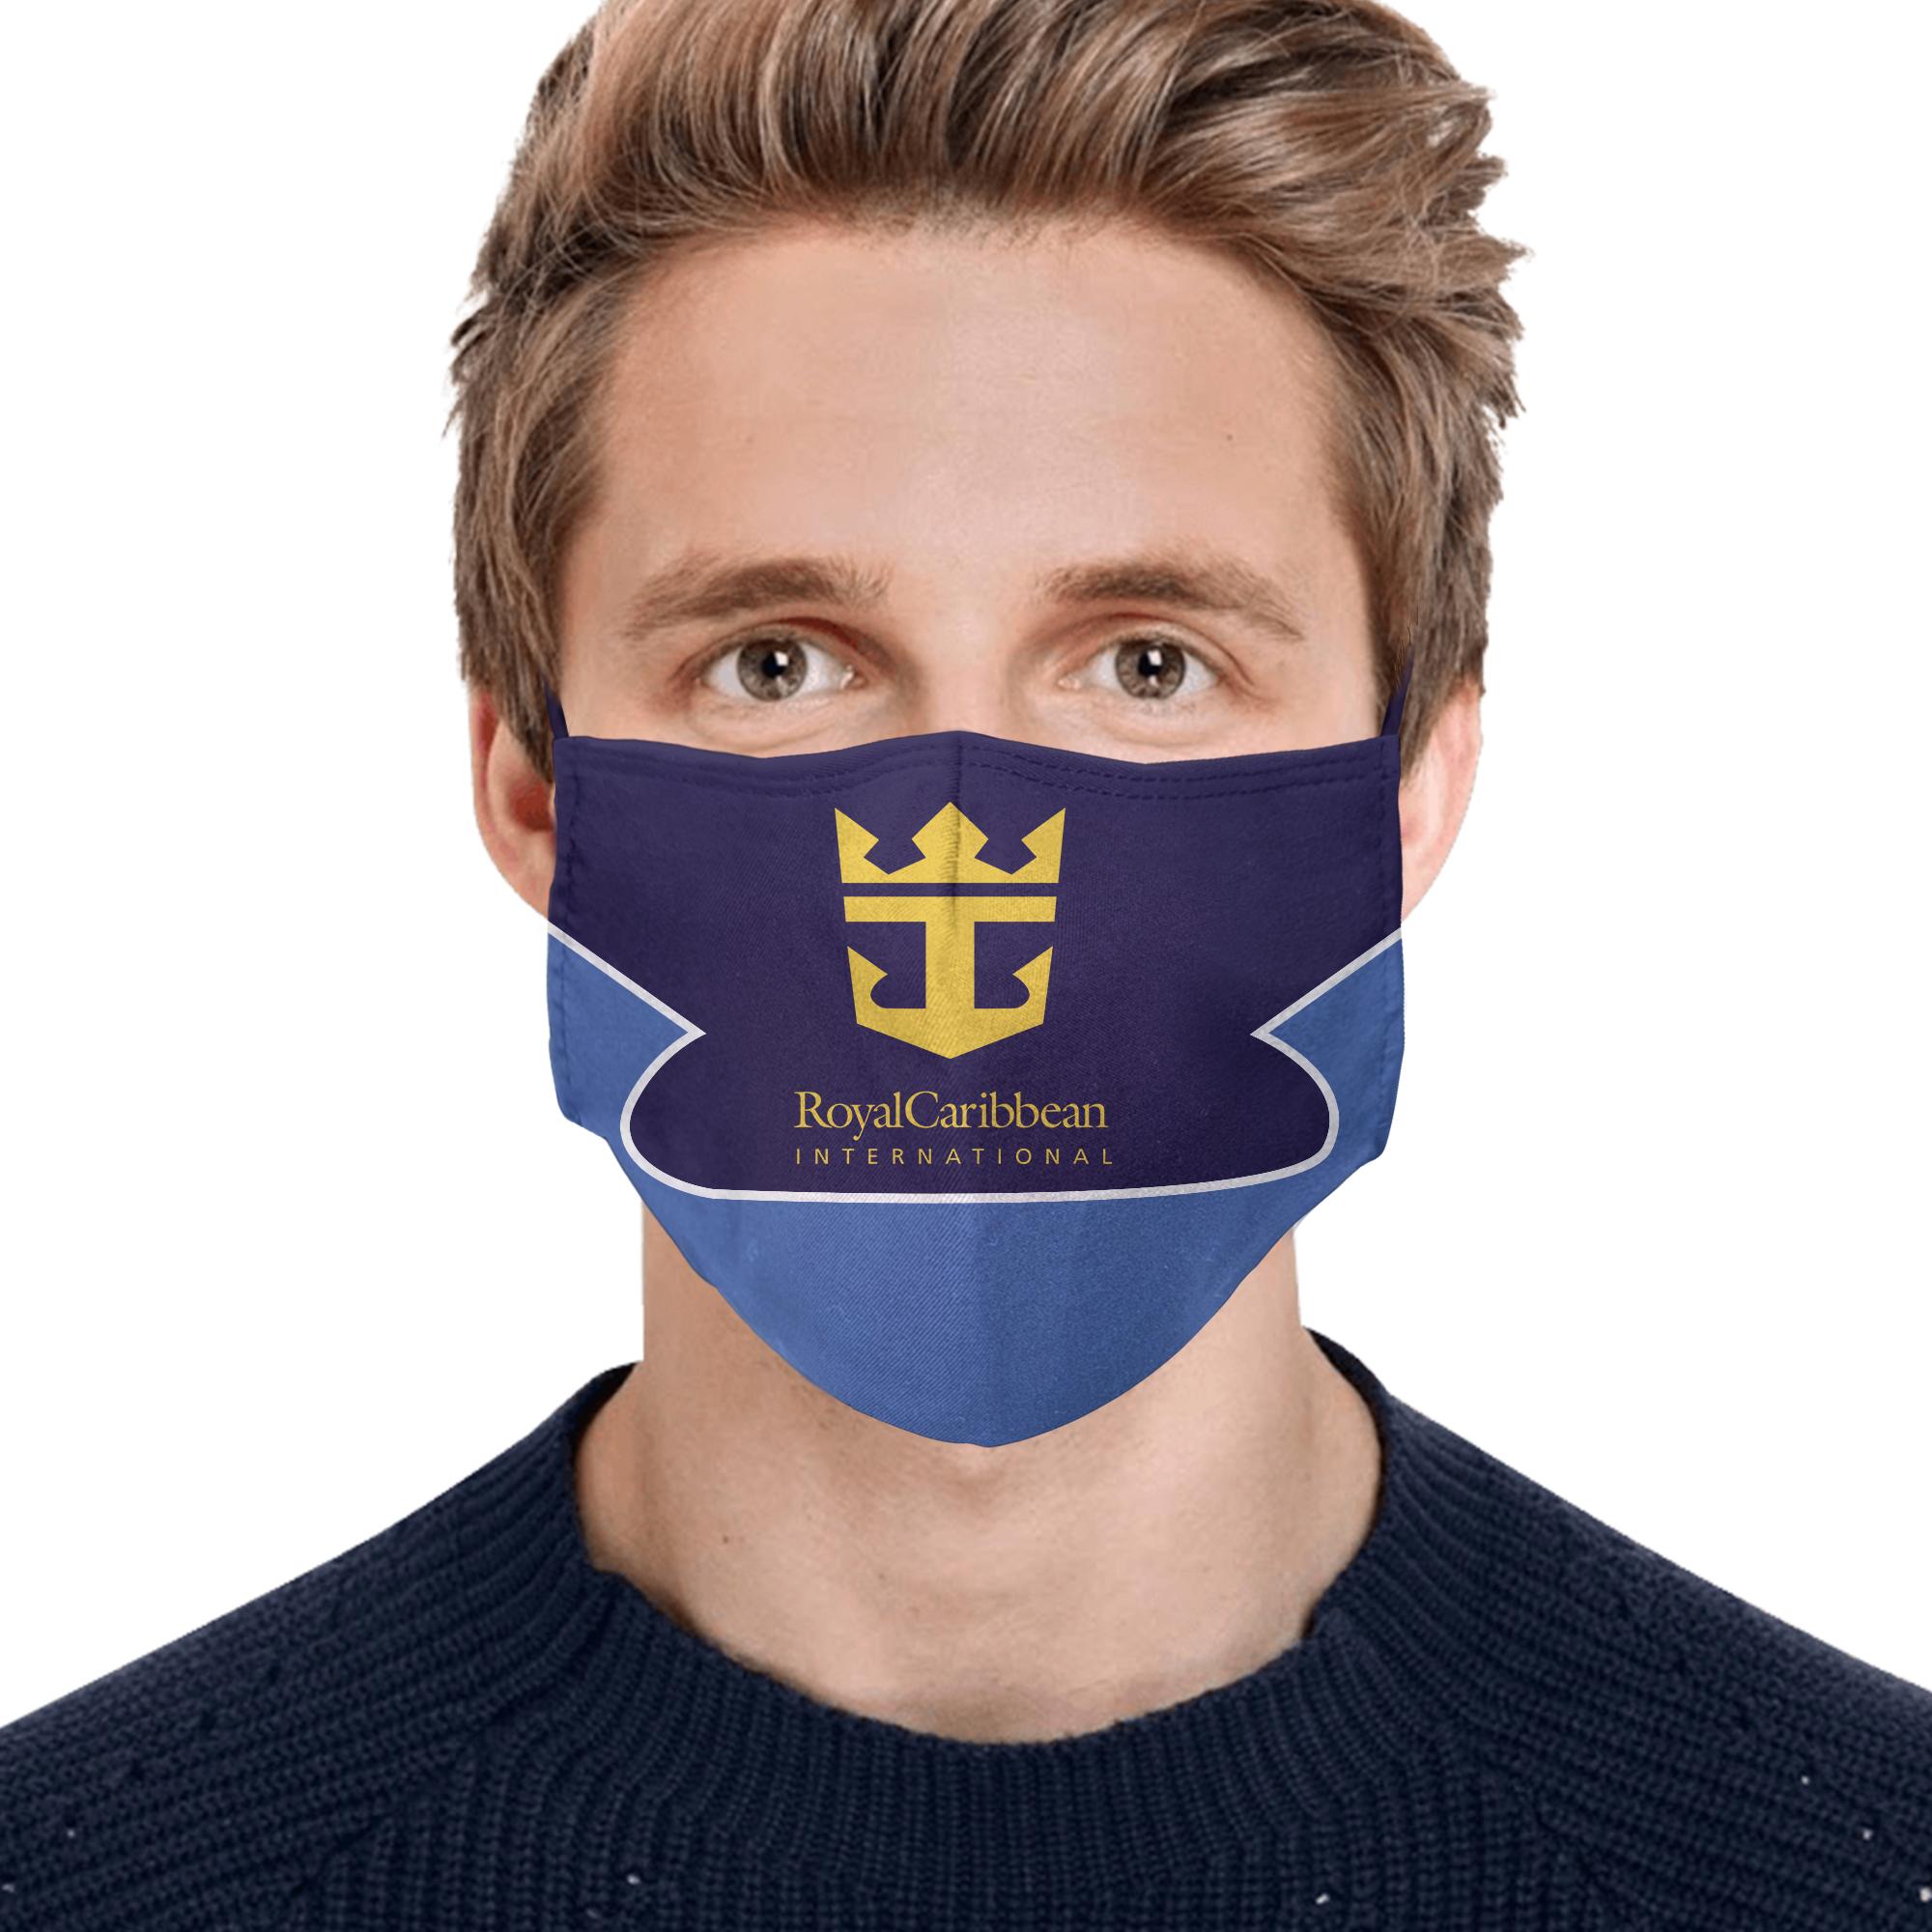 Royal caribbean international full printing face mask 4